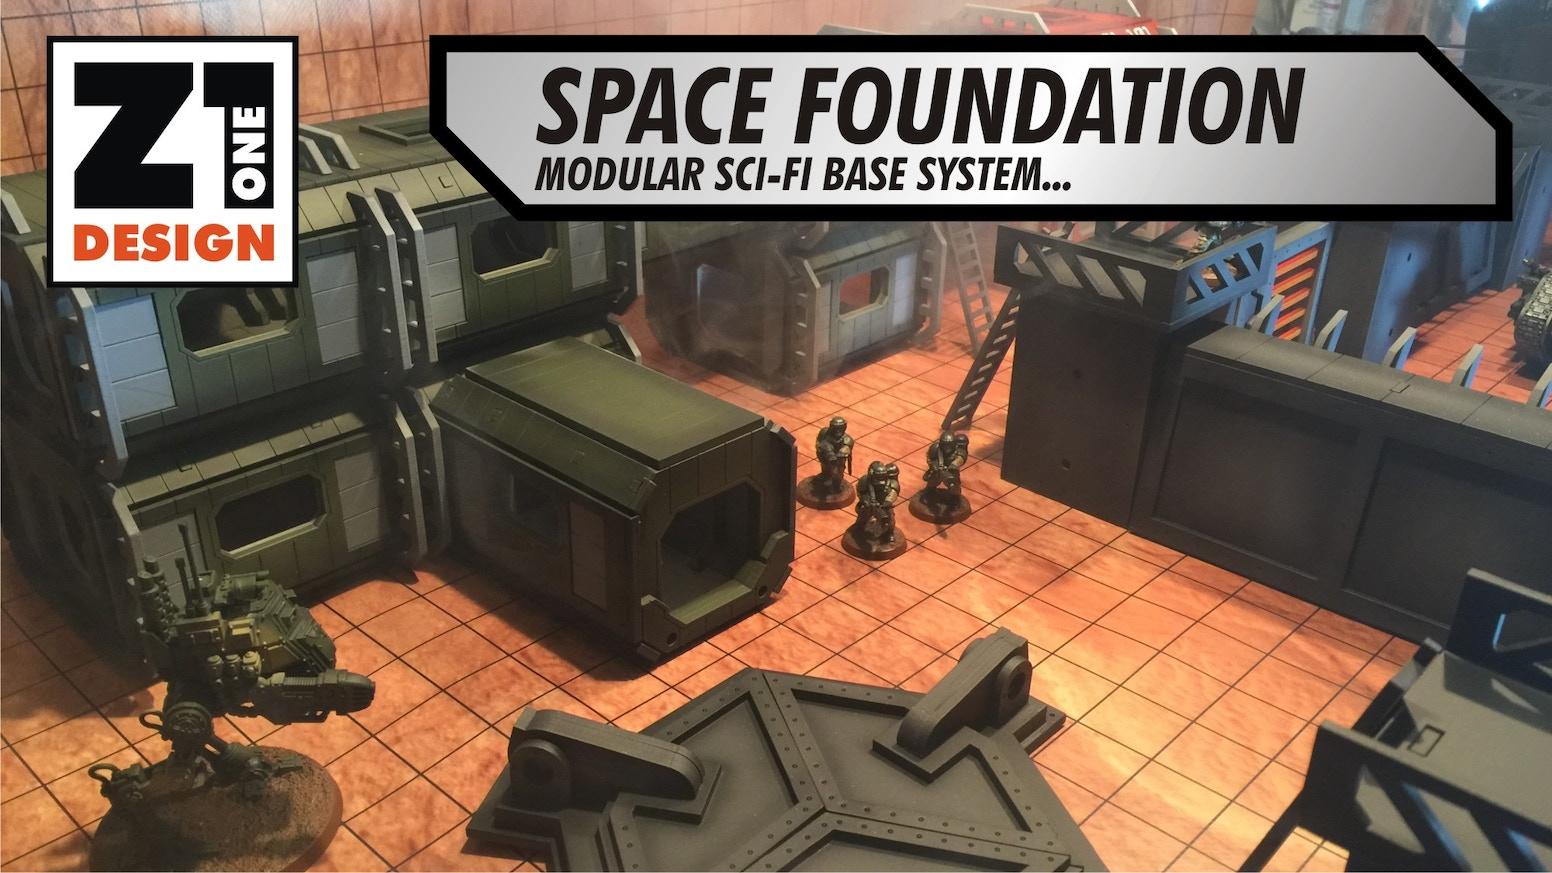 SPACE FOUNDATION 28mm TERRAIN by Jon Stynes — Kickstarter